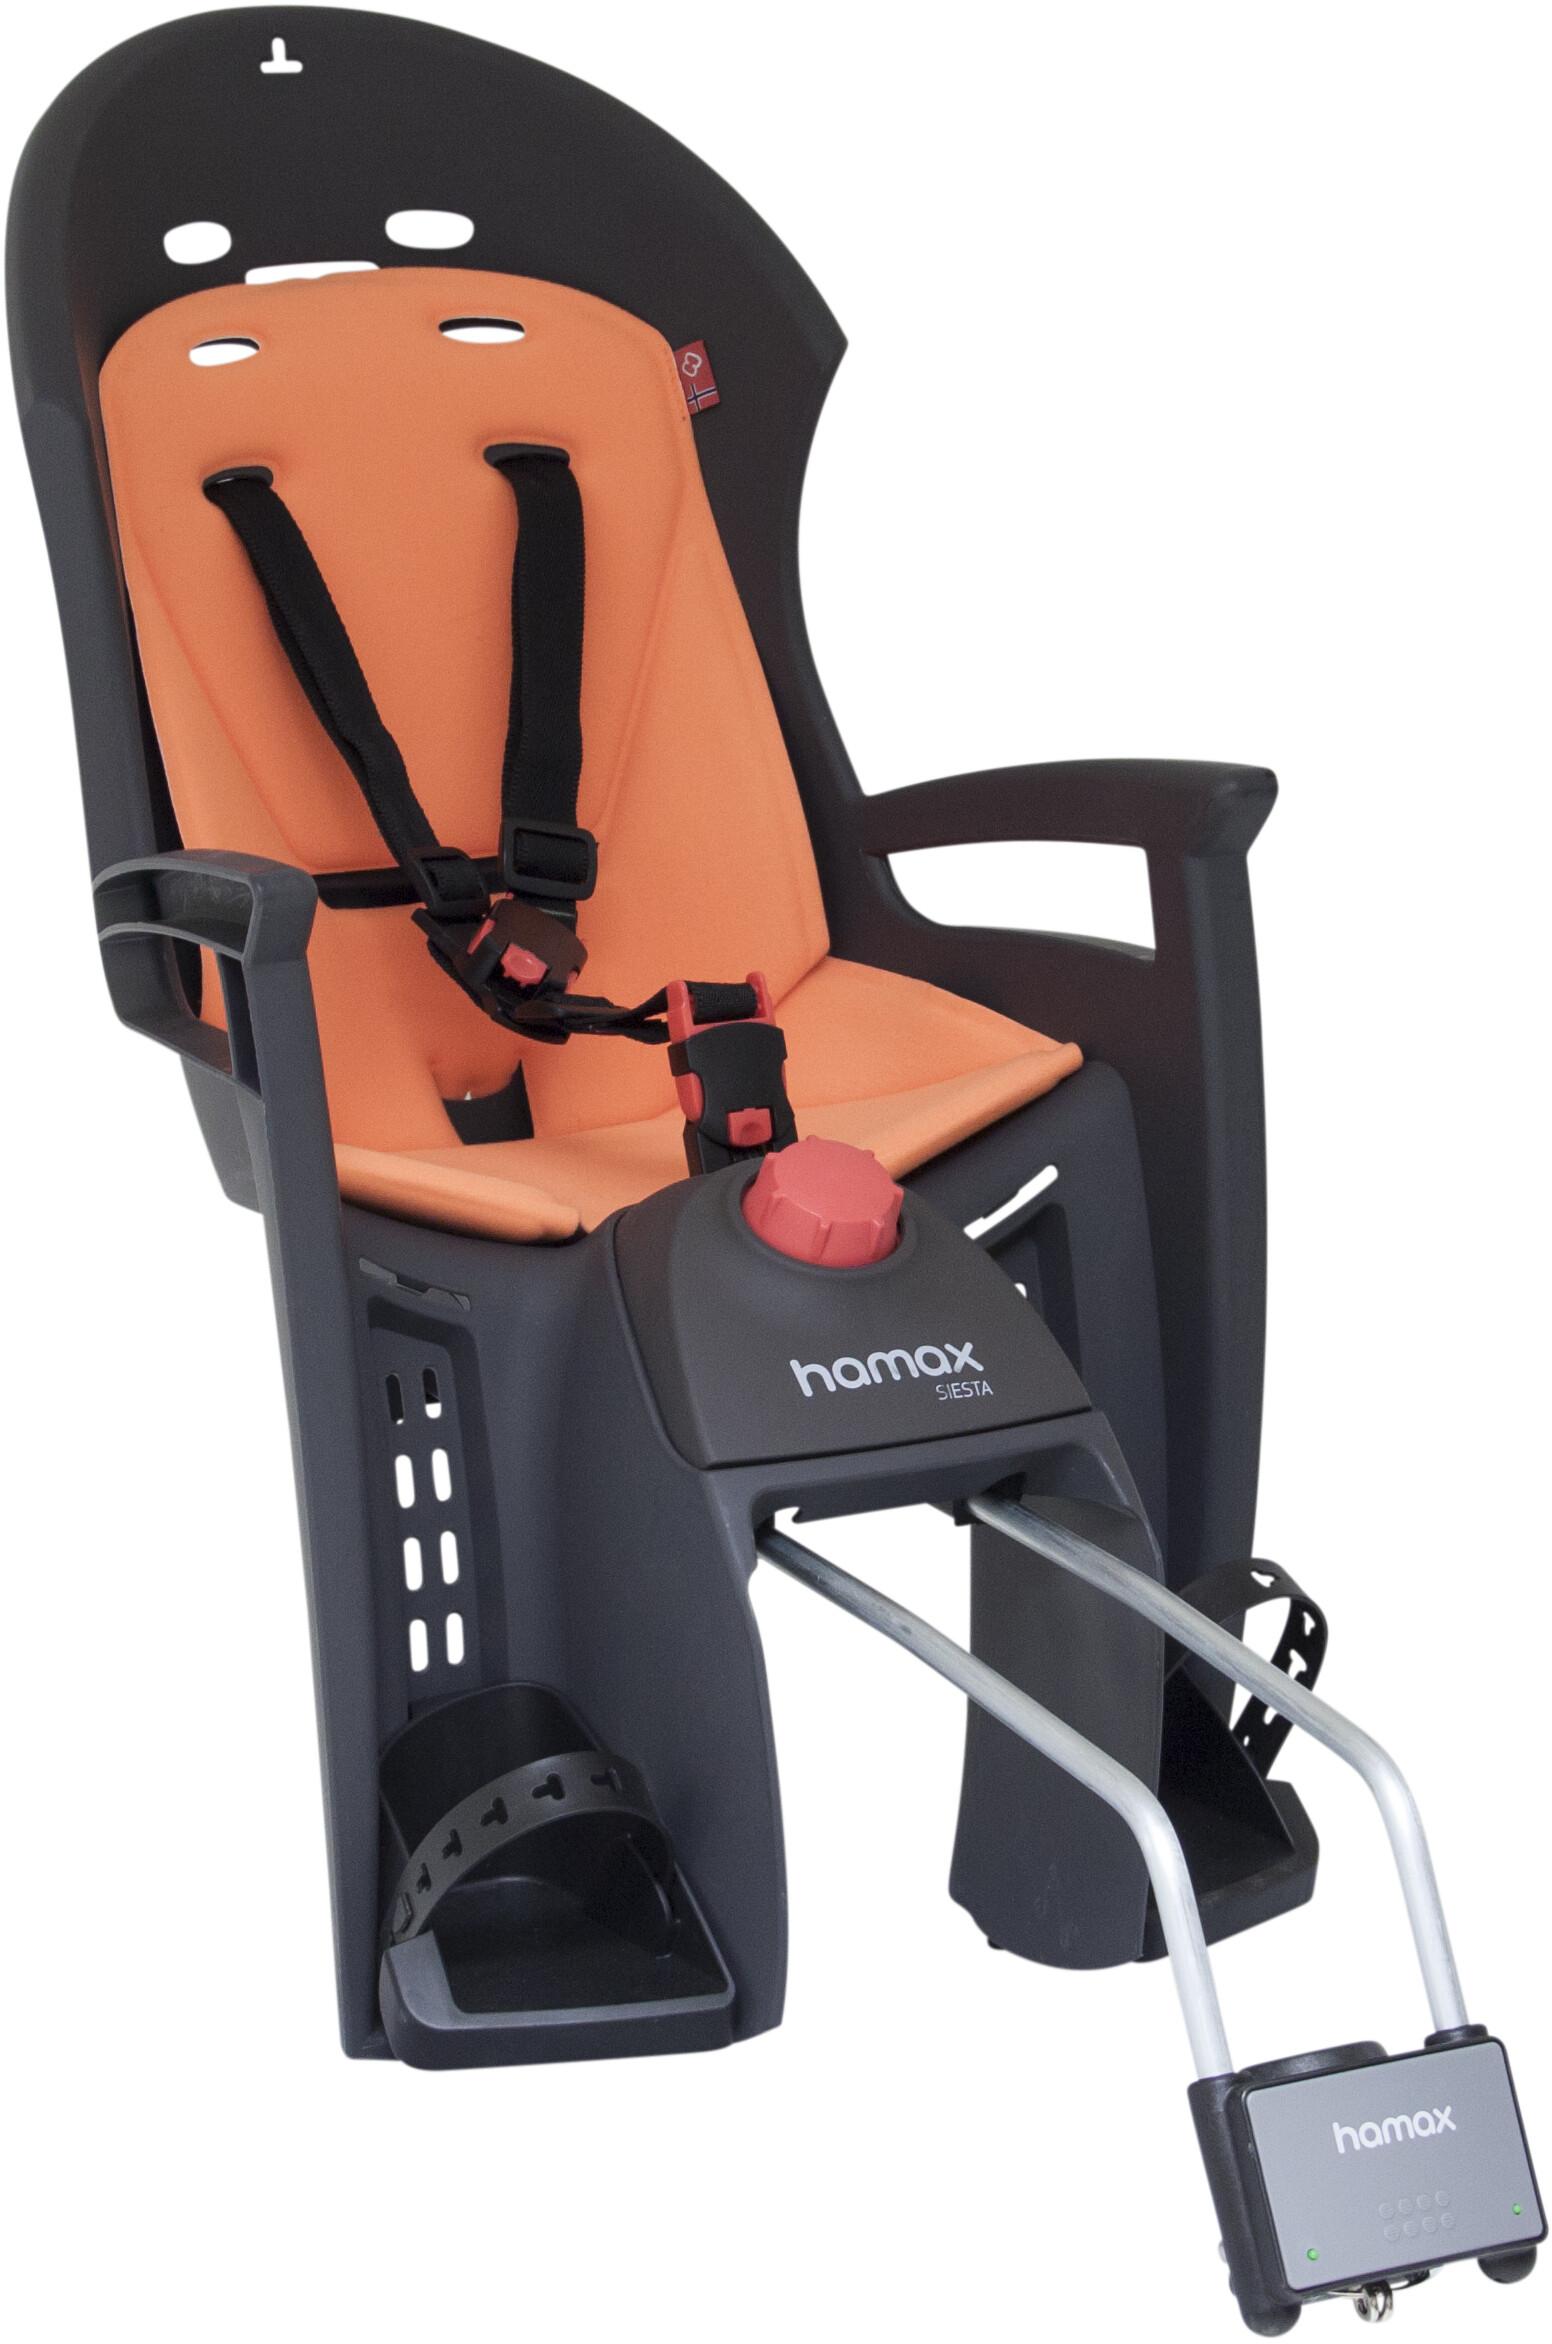 utterly stylish good looking shop Hamax Siesta Child Seat black/orange